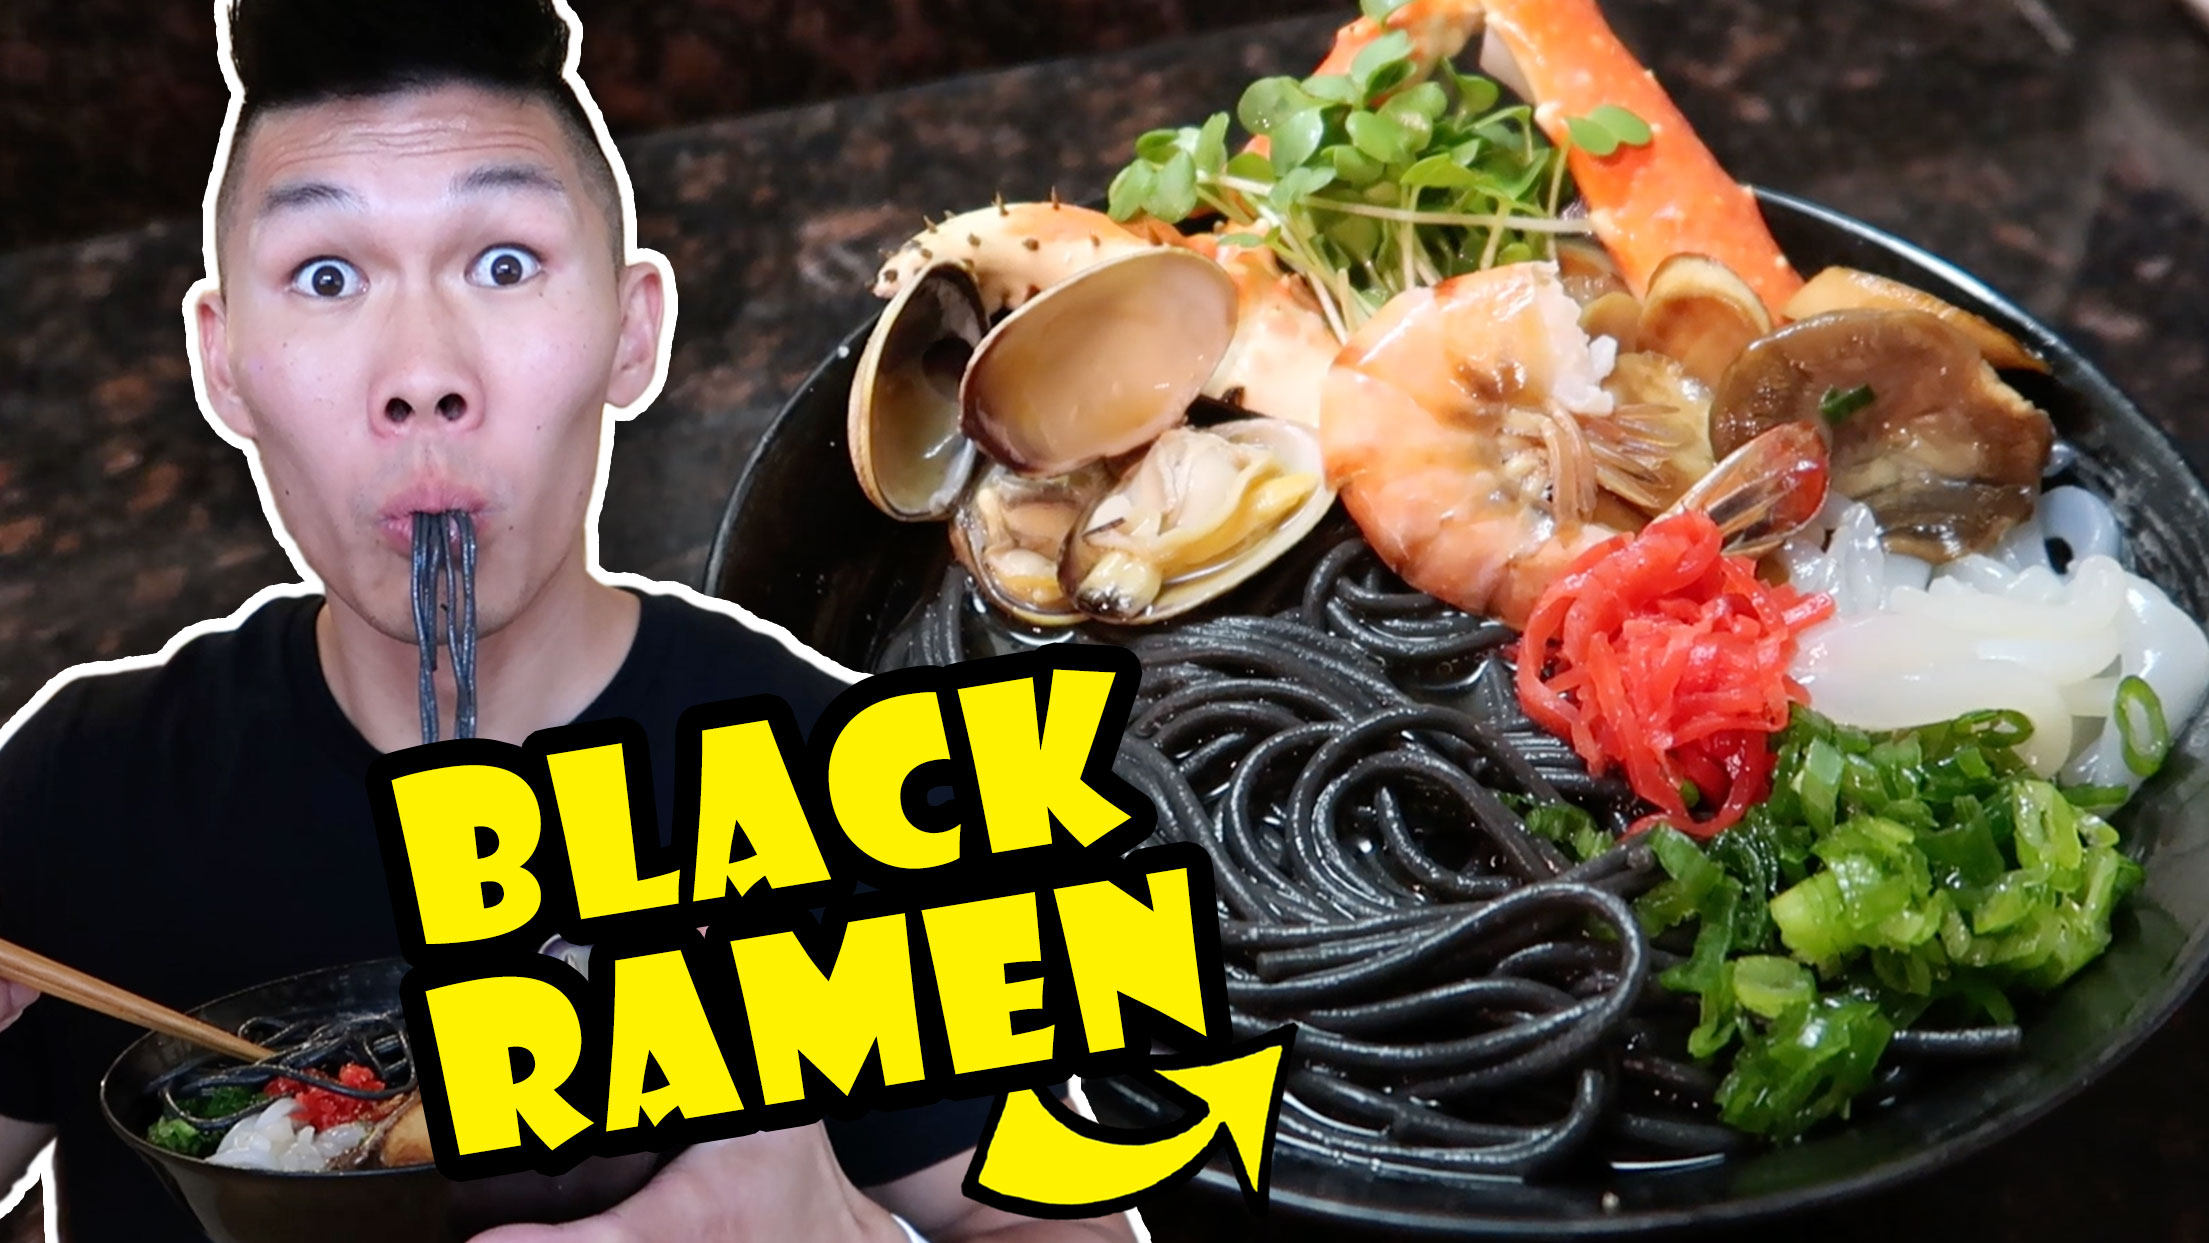 BLACK RAMEN NOODLES + SEAFOOD RECIPE UPGRADE